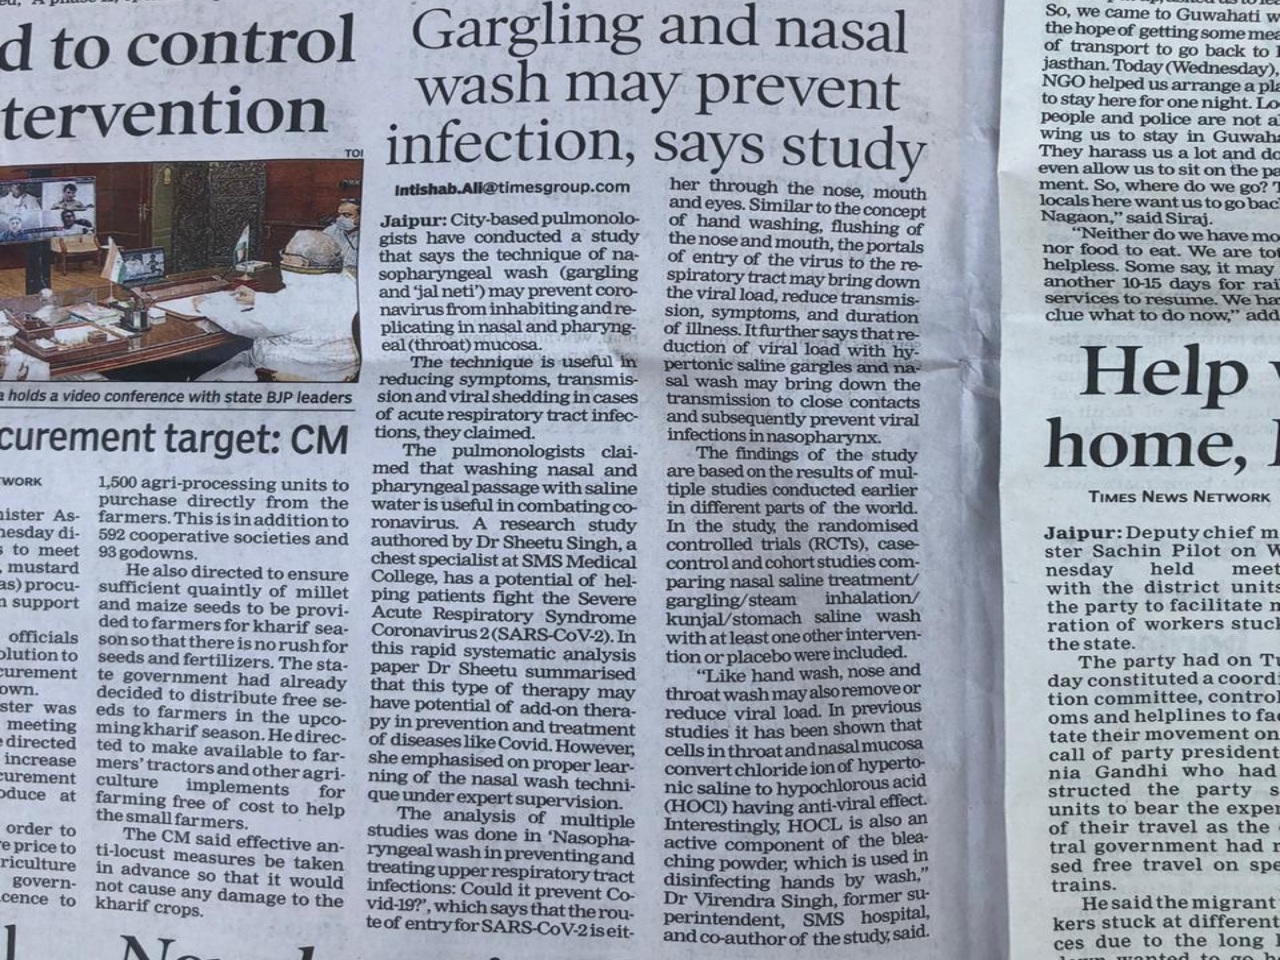 https://www.drsheetusingh.com/wp-content/uploads/2019/12/Times-of-India-5-7-2020.jpg